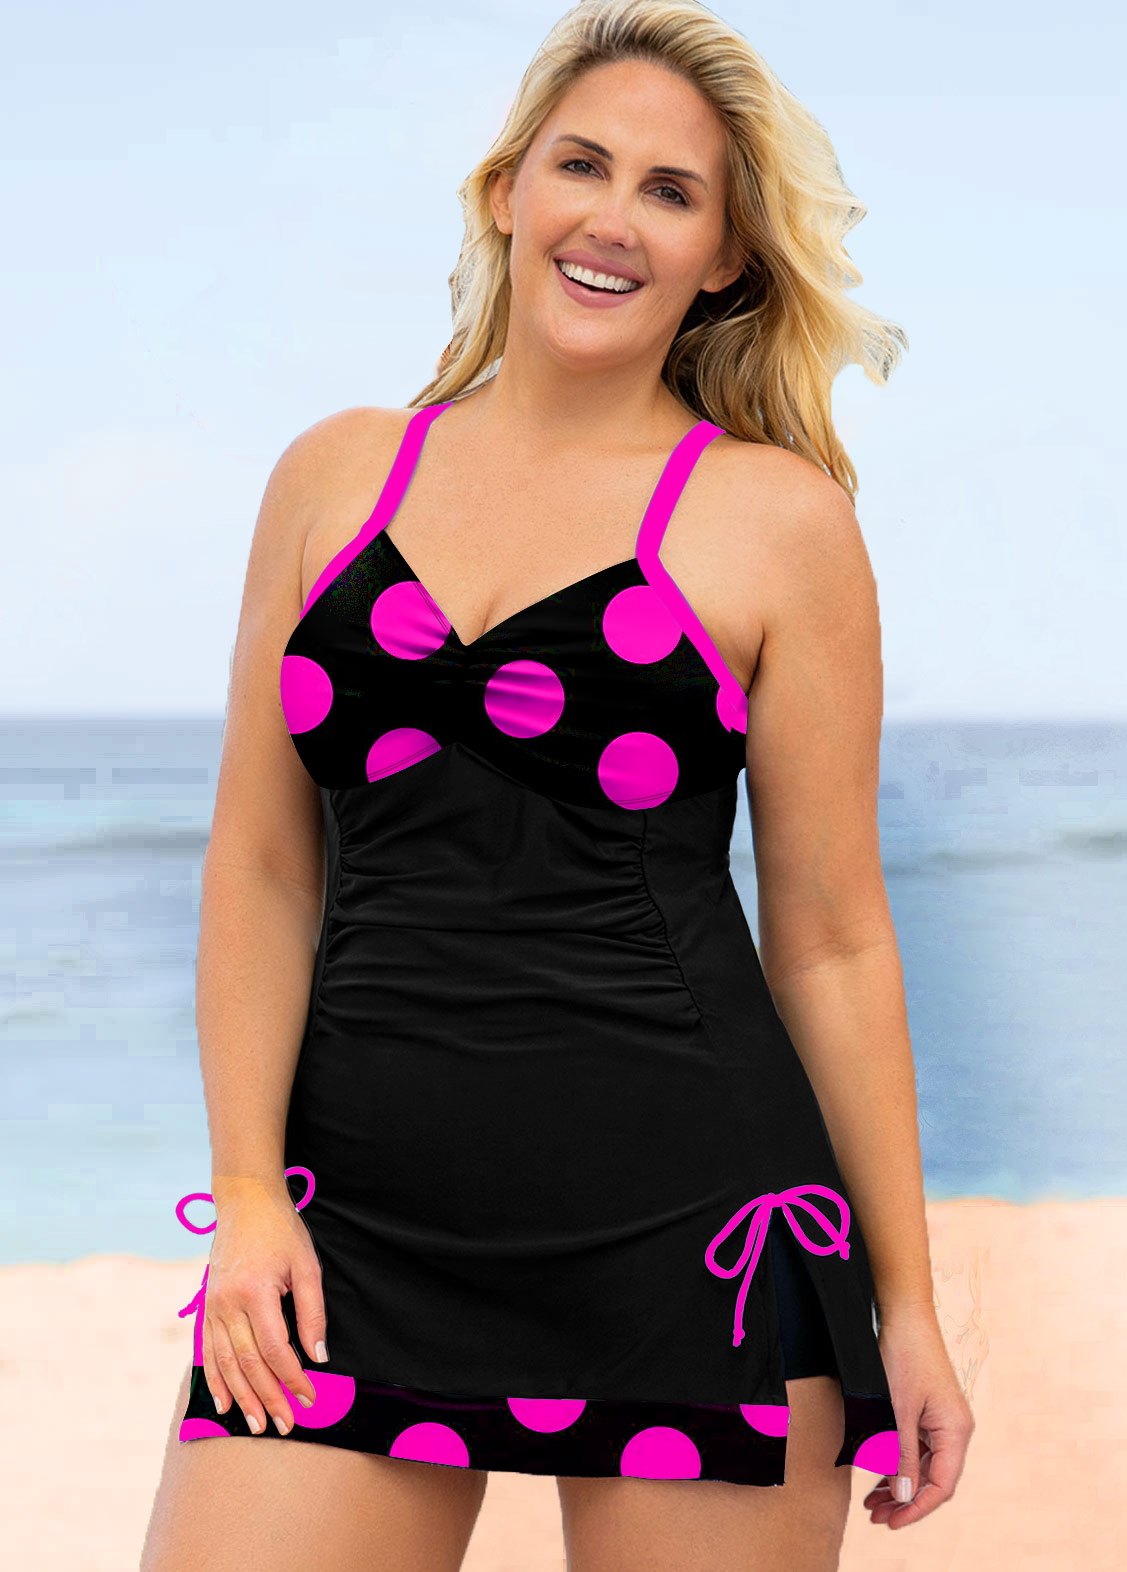 ROTITA Plus Size Polka Dot Bowknot Swimwear Top